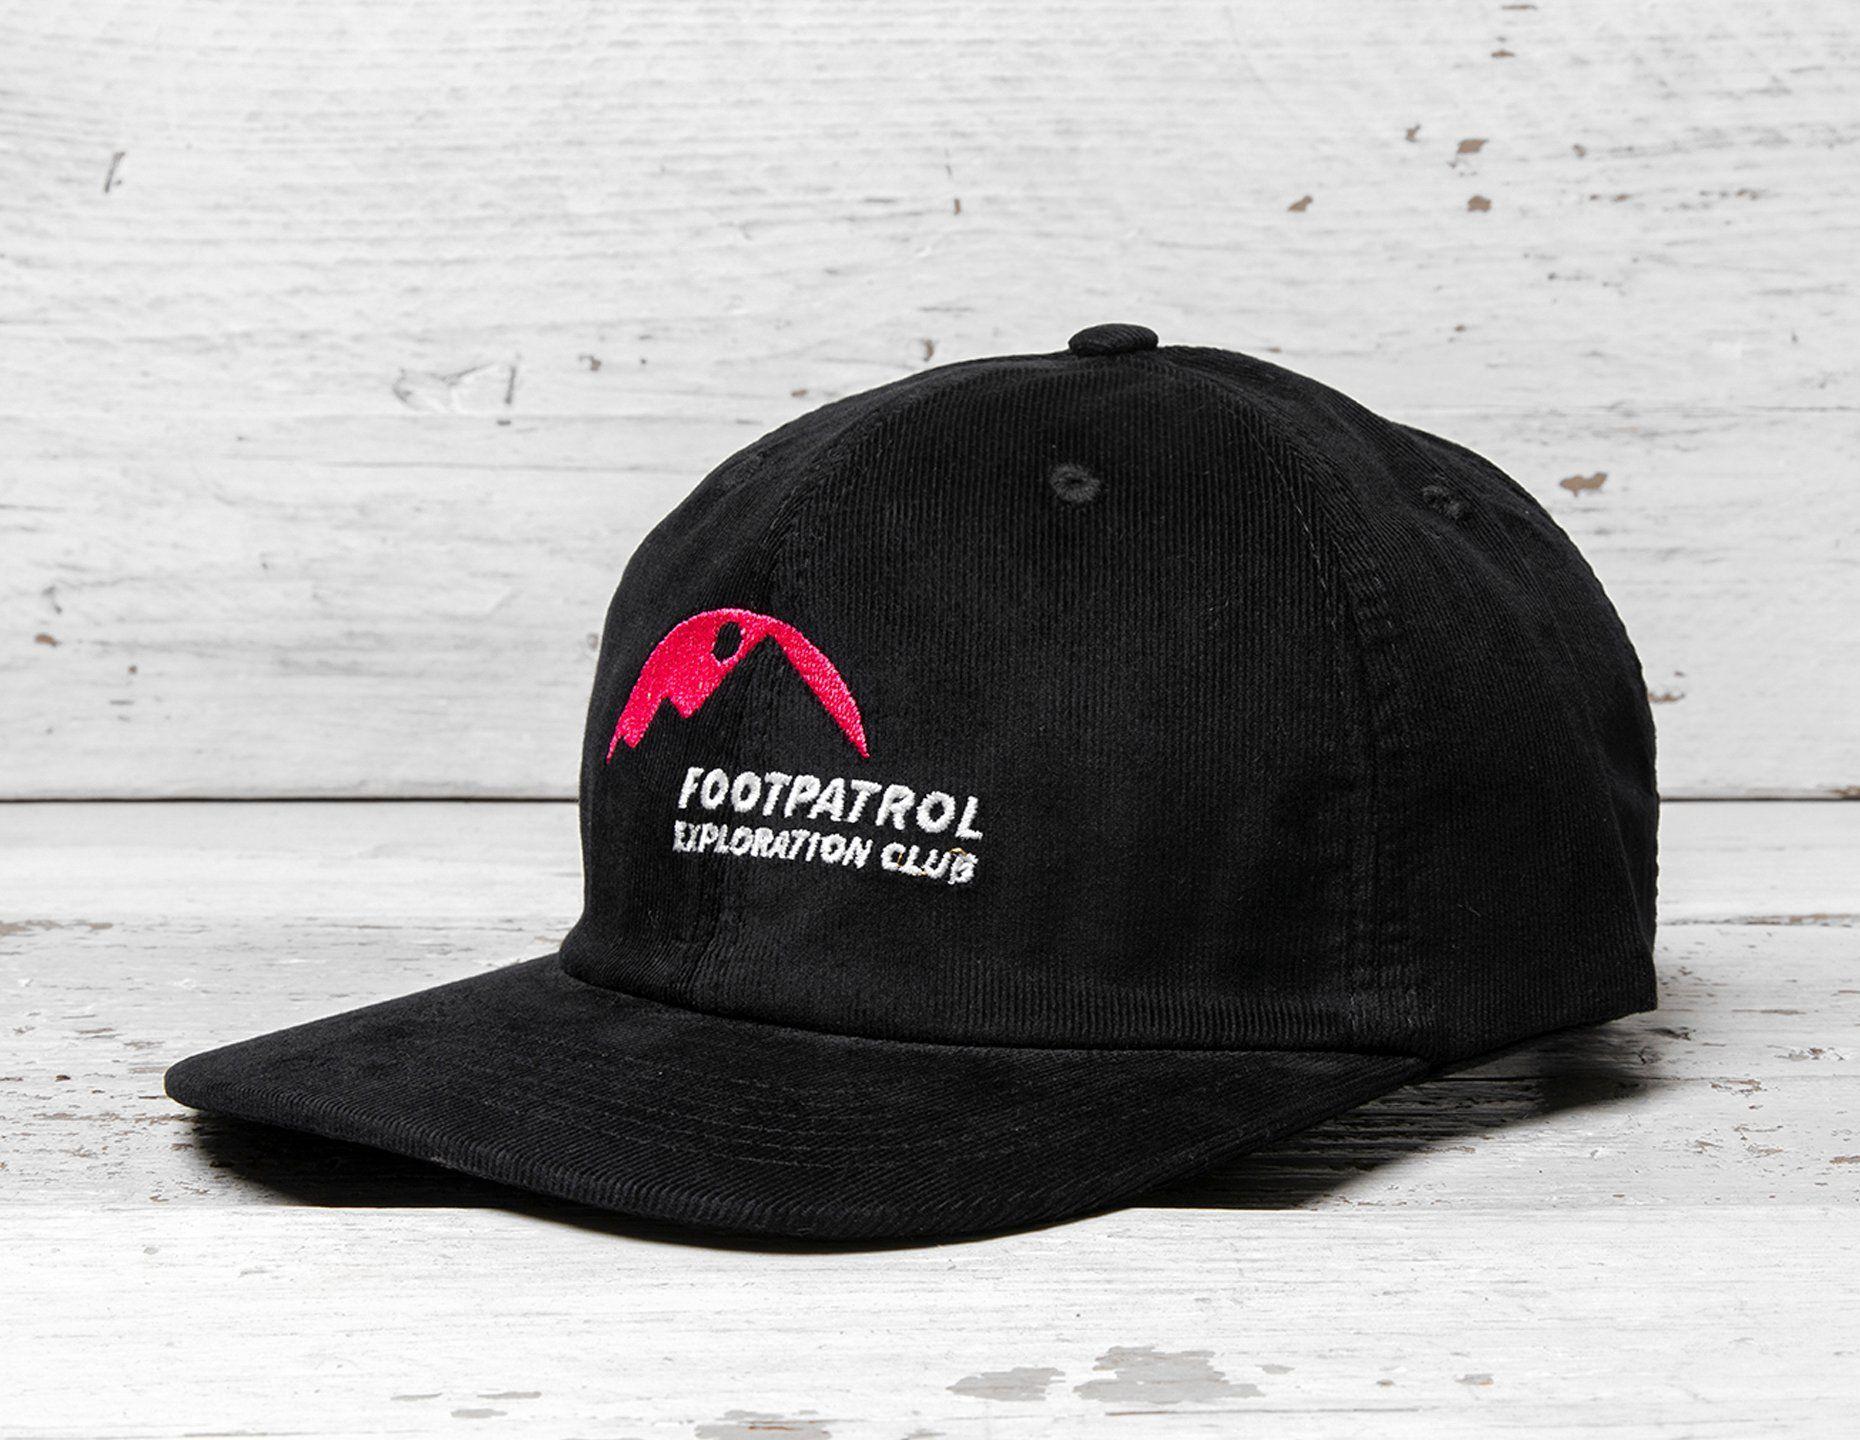 Footpatrol x Theobalds: Exploration Club Souvenir Cap